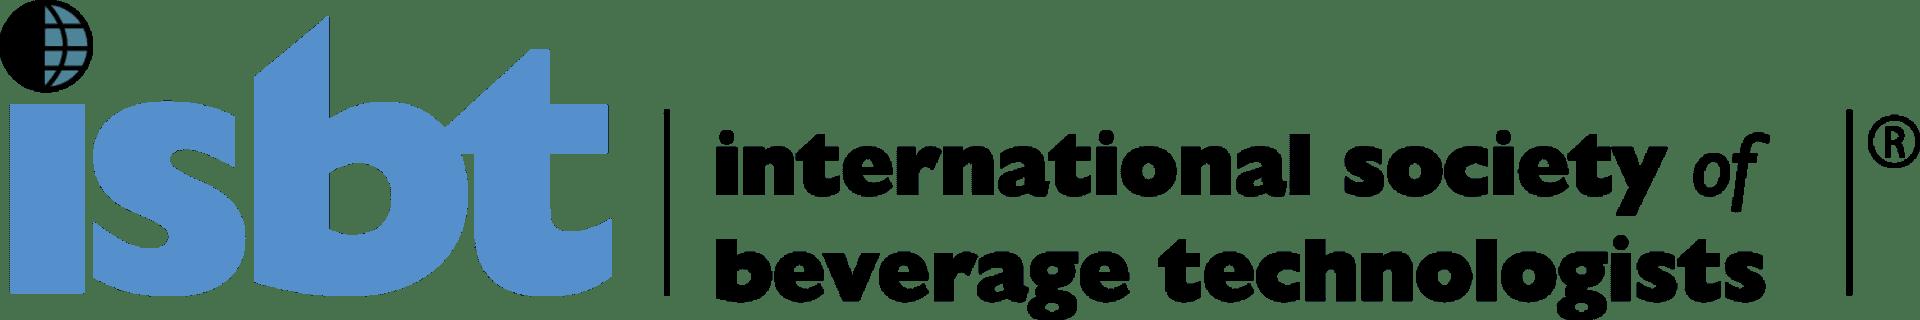 ISBT-Logo_zmf5xb